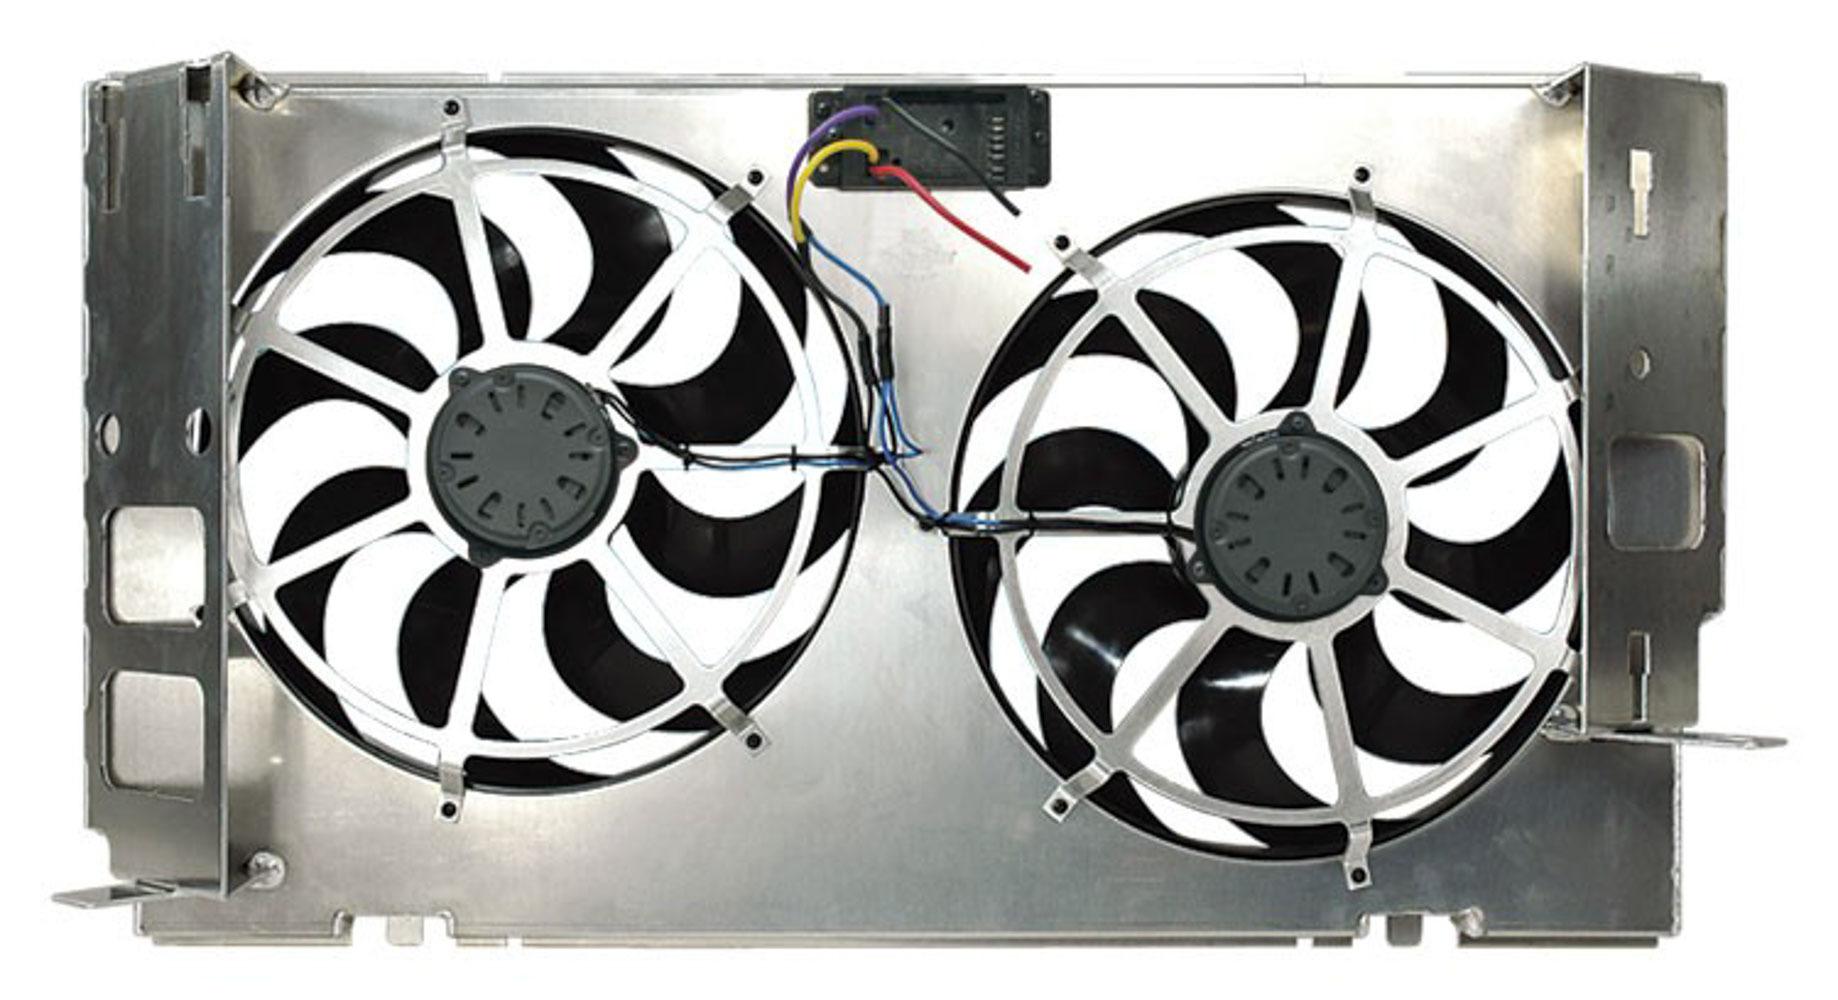 Flex-A-Lite 103961 Electric Cooling Fan, Direct-Fit, Dual 15 in Fan, Puller, 5500 CFM, Curved Blade, Controller, Aluminum Shroud, Dodge Cummins, Dodge Fullsize Truck 1994-2002, Kit